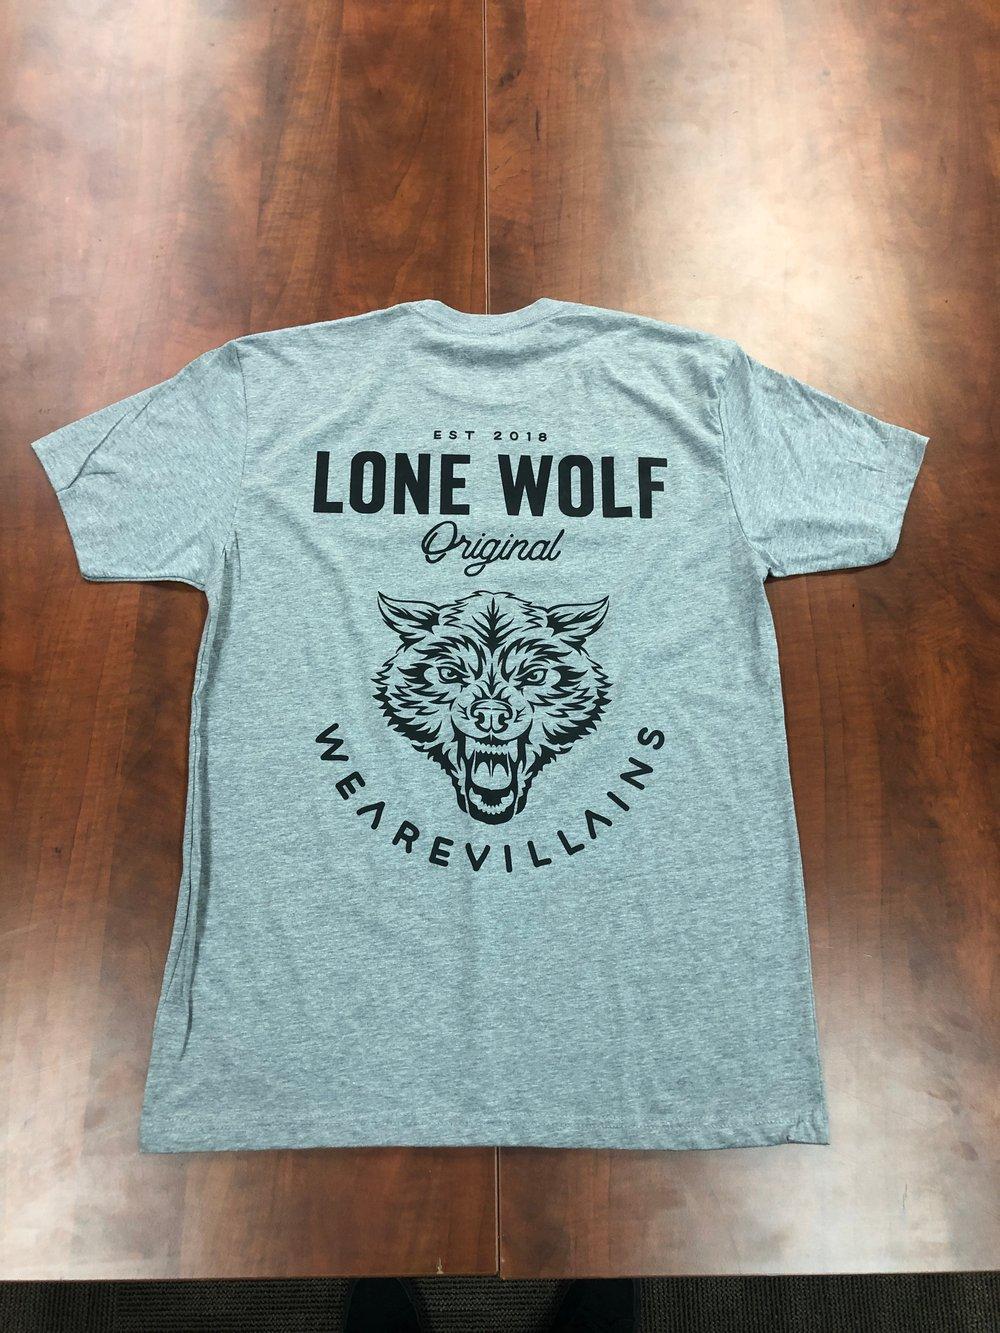 Lone Wolf tee black/grey/military green